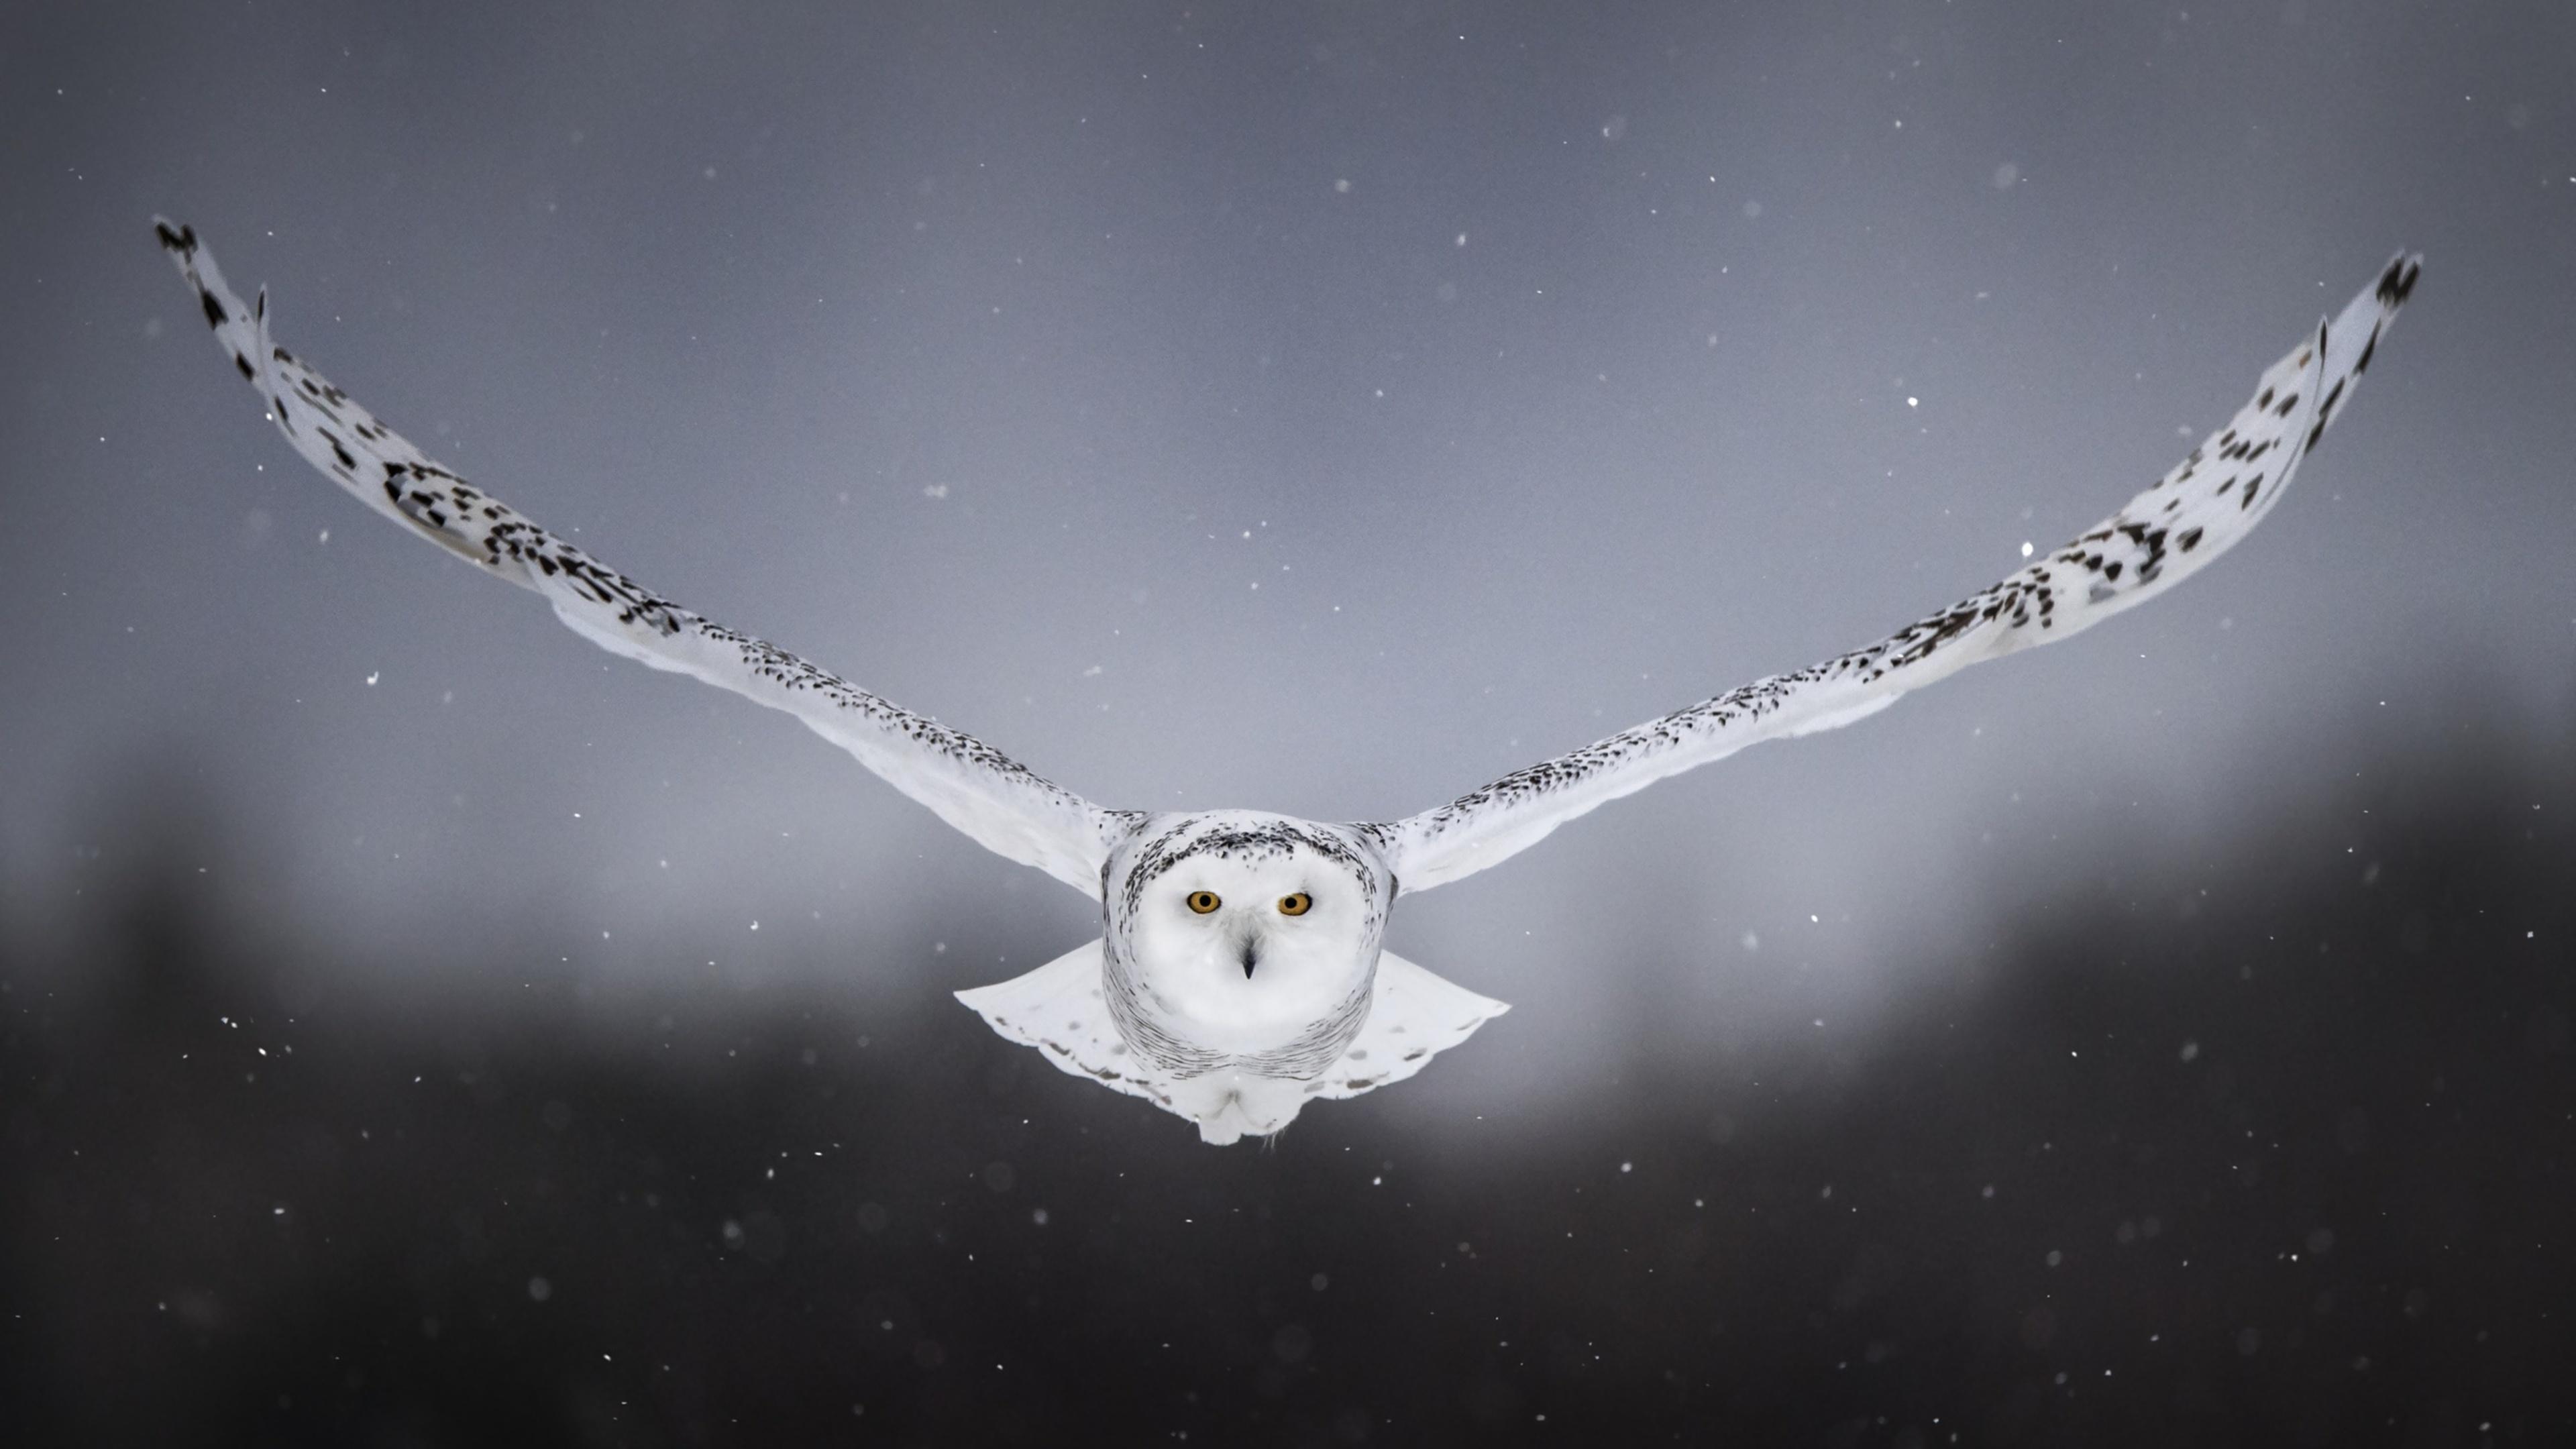 3840x2160 White Snow Owl Flying 4k HD 4k Wallpapers ...